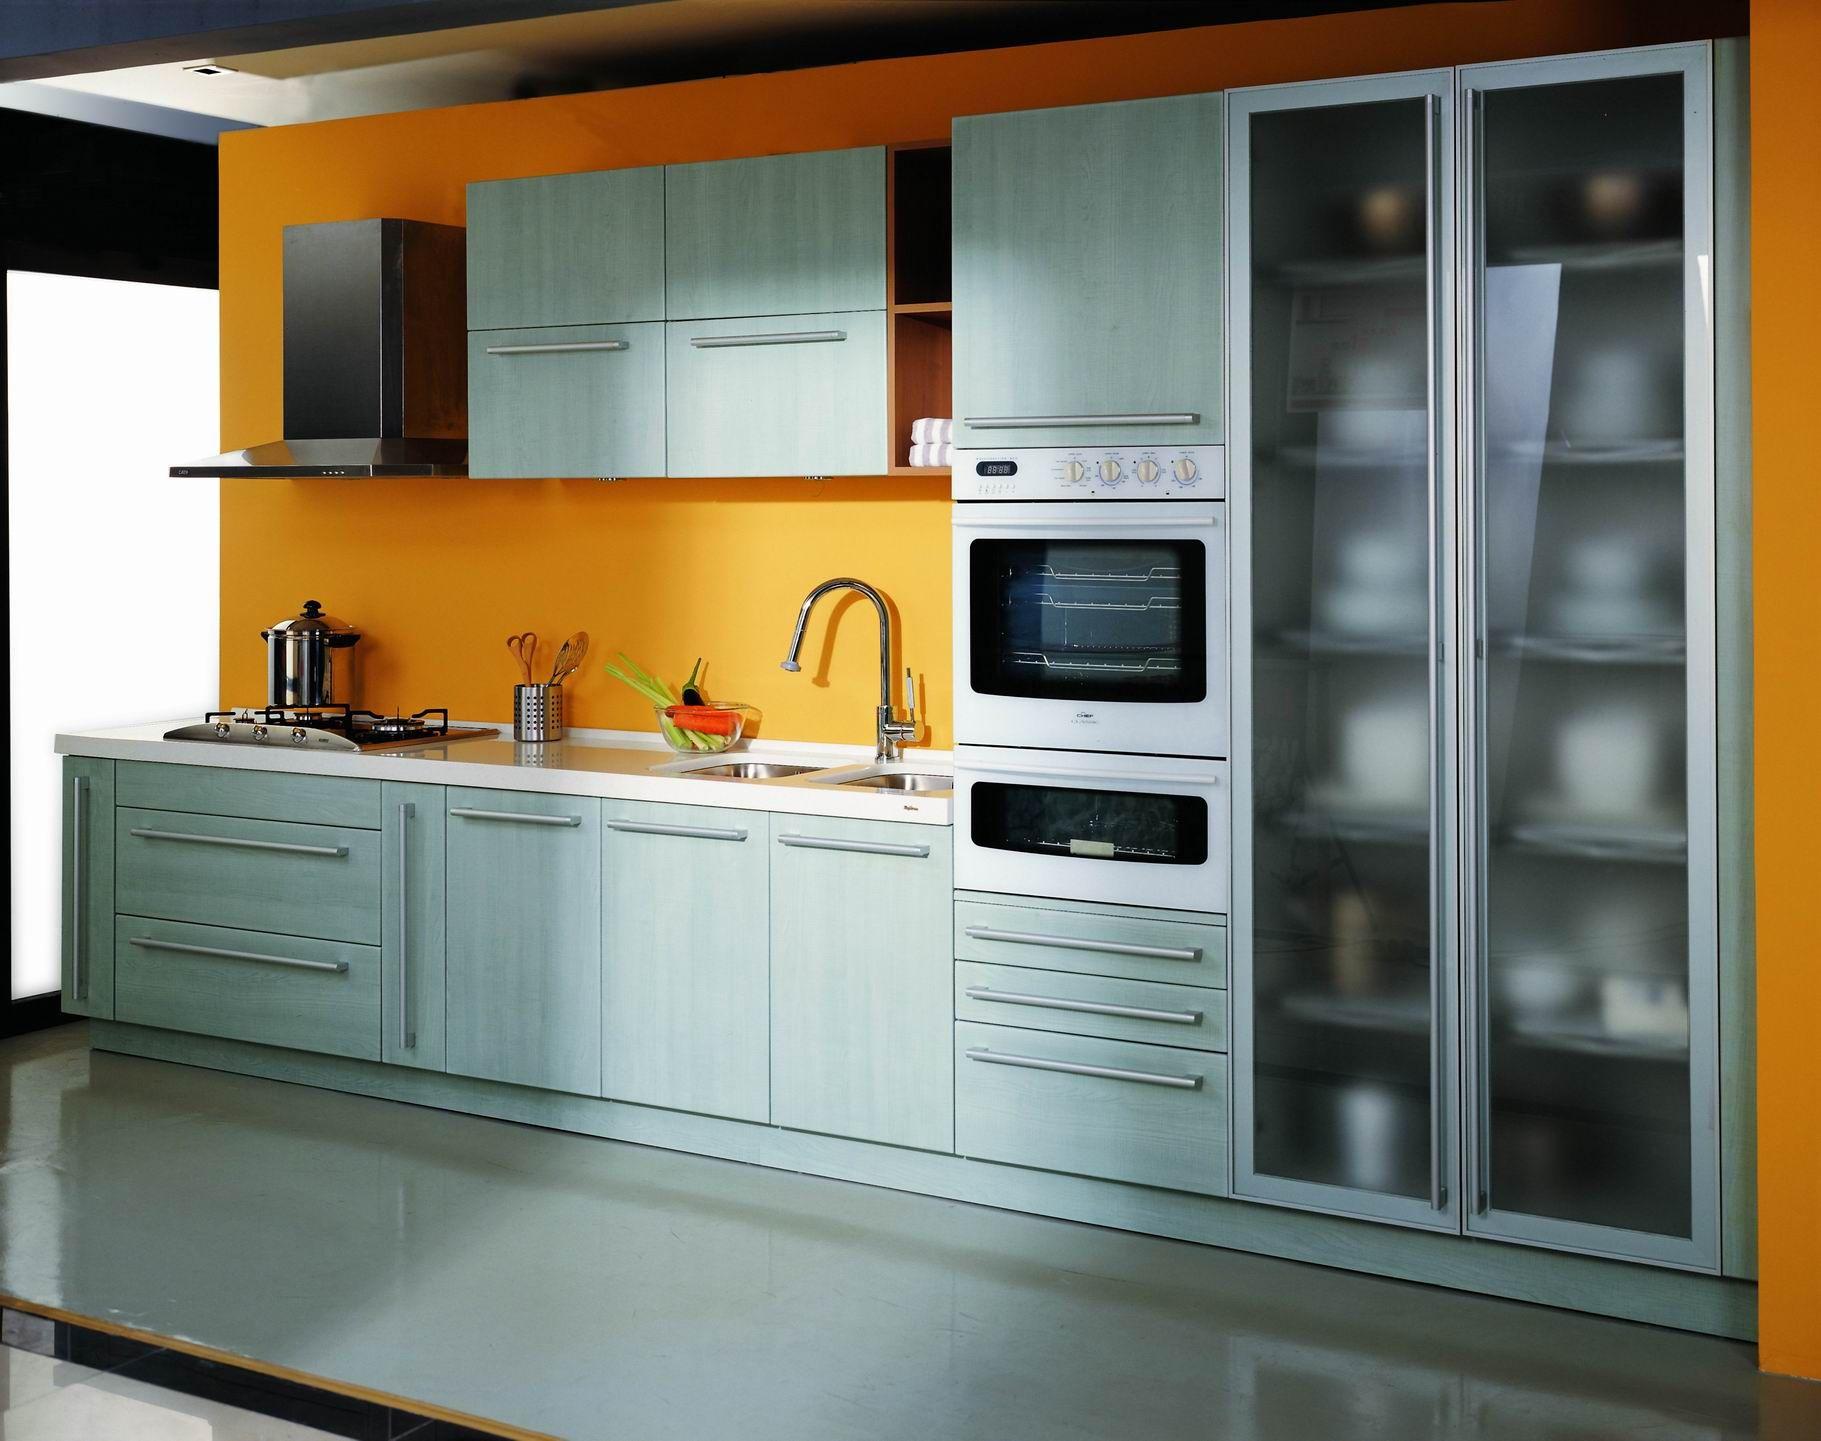 Home design chinese kitchen design - Fancy Kitchen Design Orange Backsplash Design Your Own Kitchen Combined With Glass Door Cabinet In Grey Color Decoration